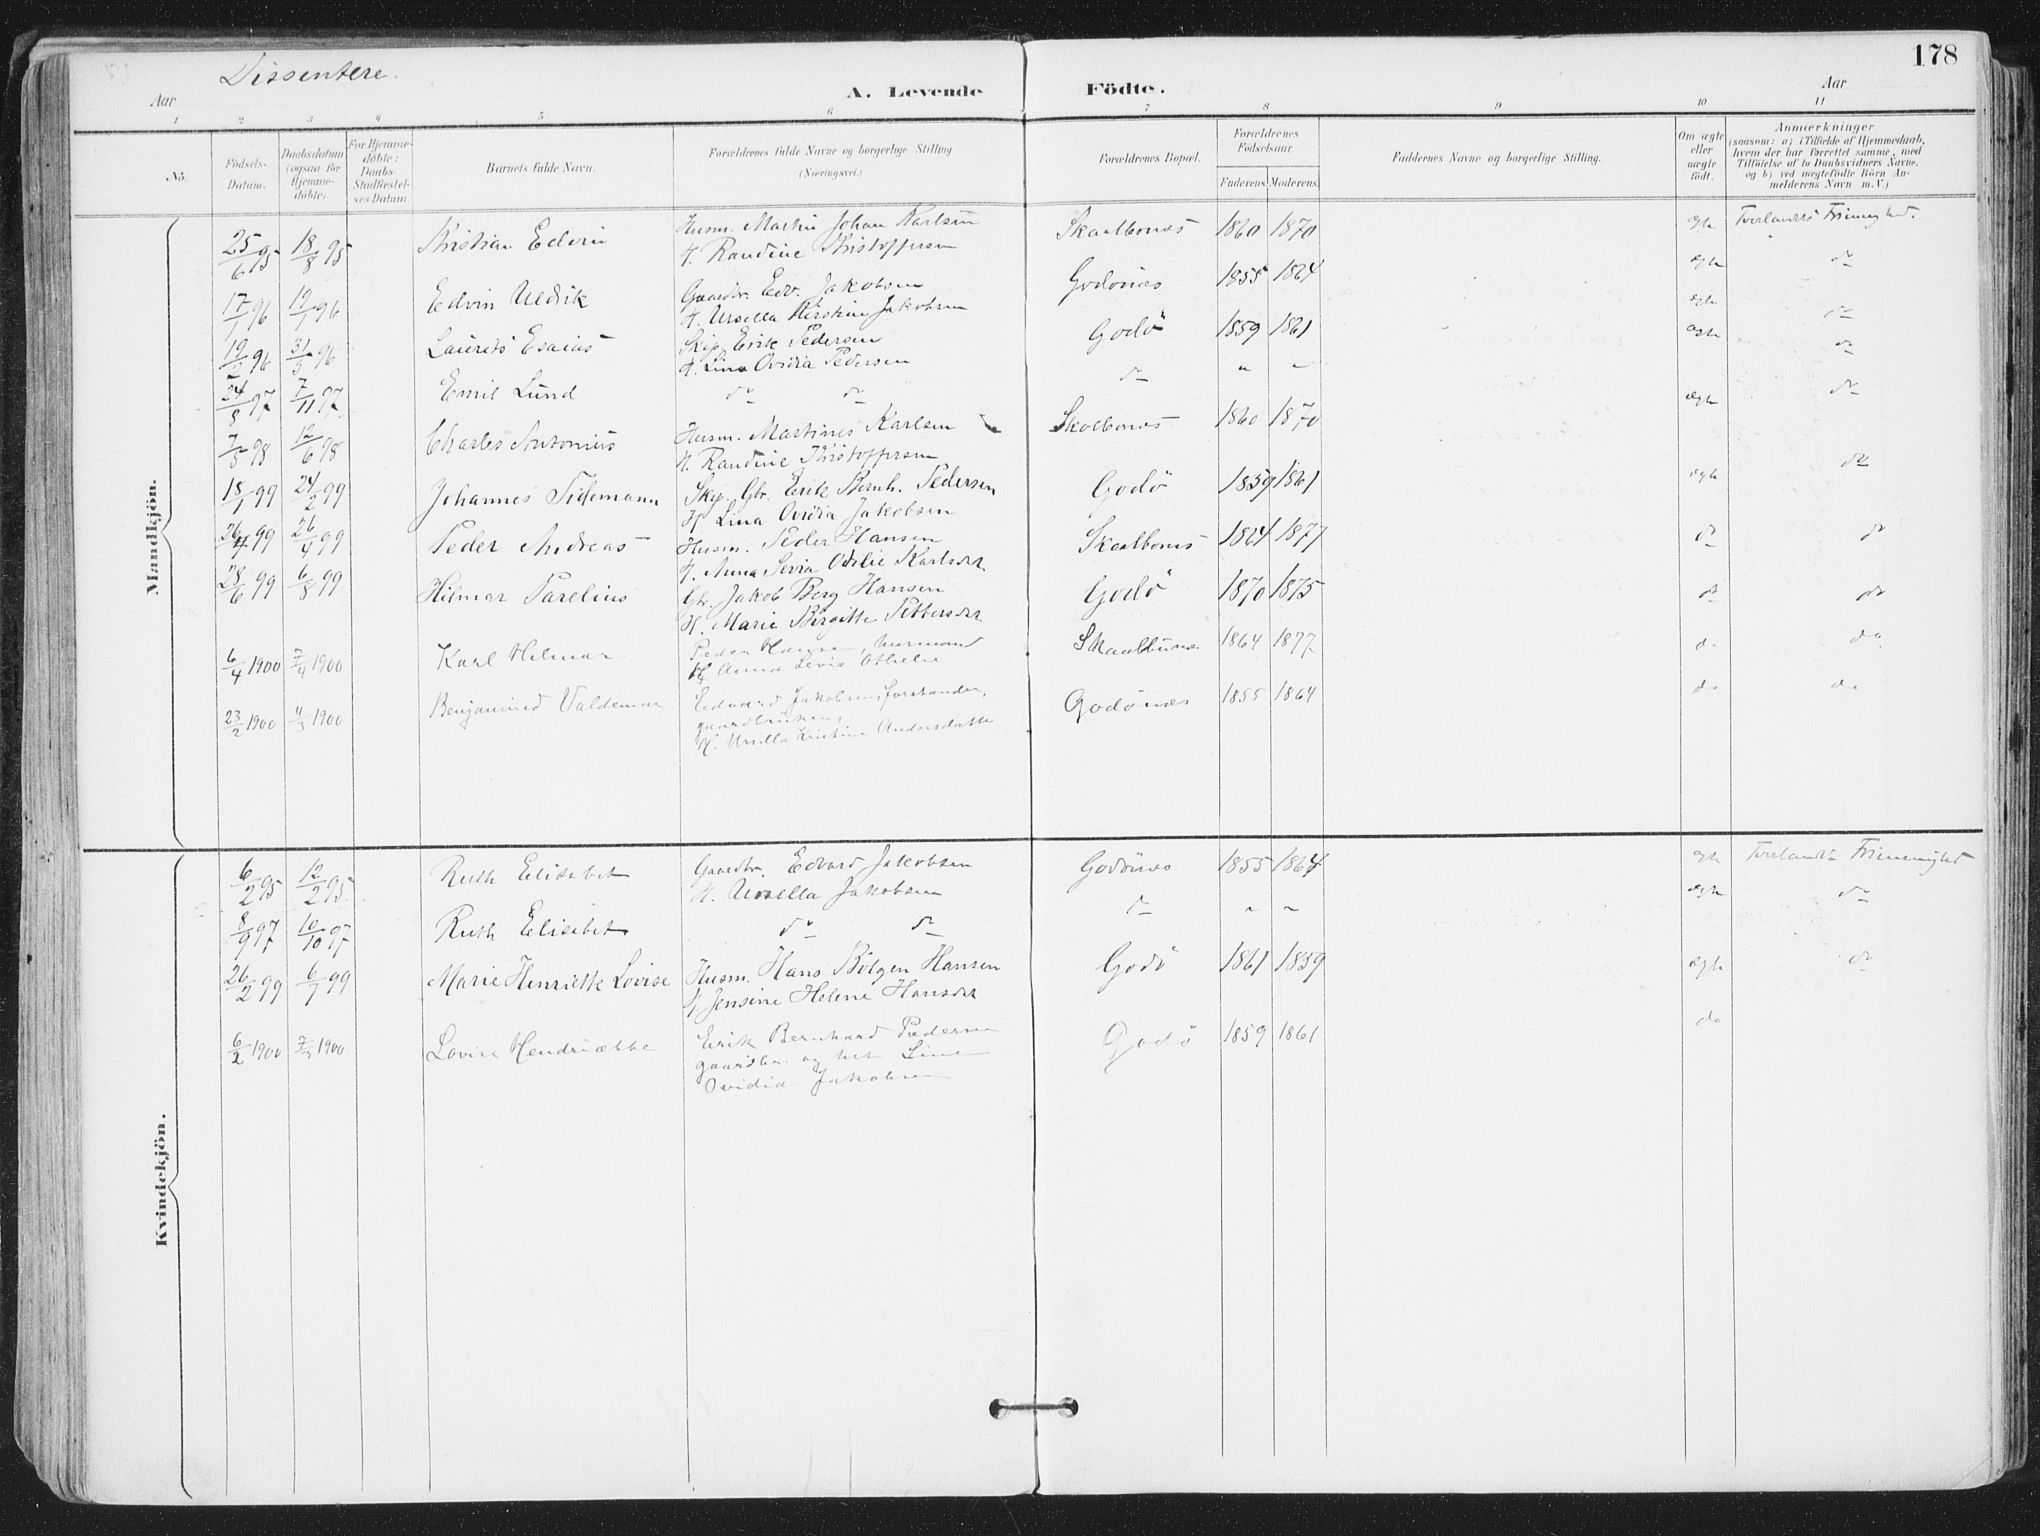 SAT, Ministerialprotokoller, klokkerbøker og fødselsregistre - Nordland, 802/L0055: Ministerialbok nr. 802A02, 1894-1915, s. 178